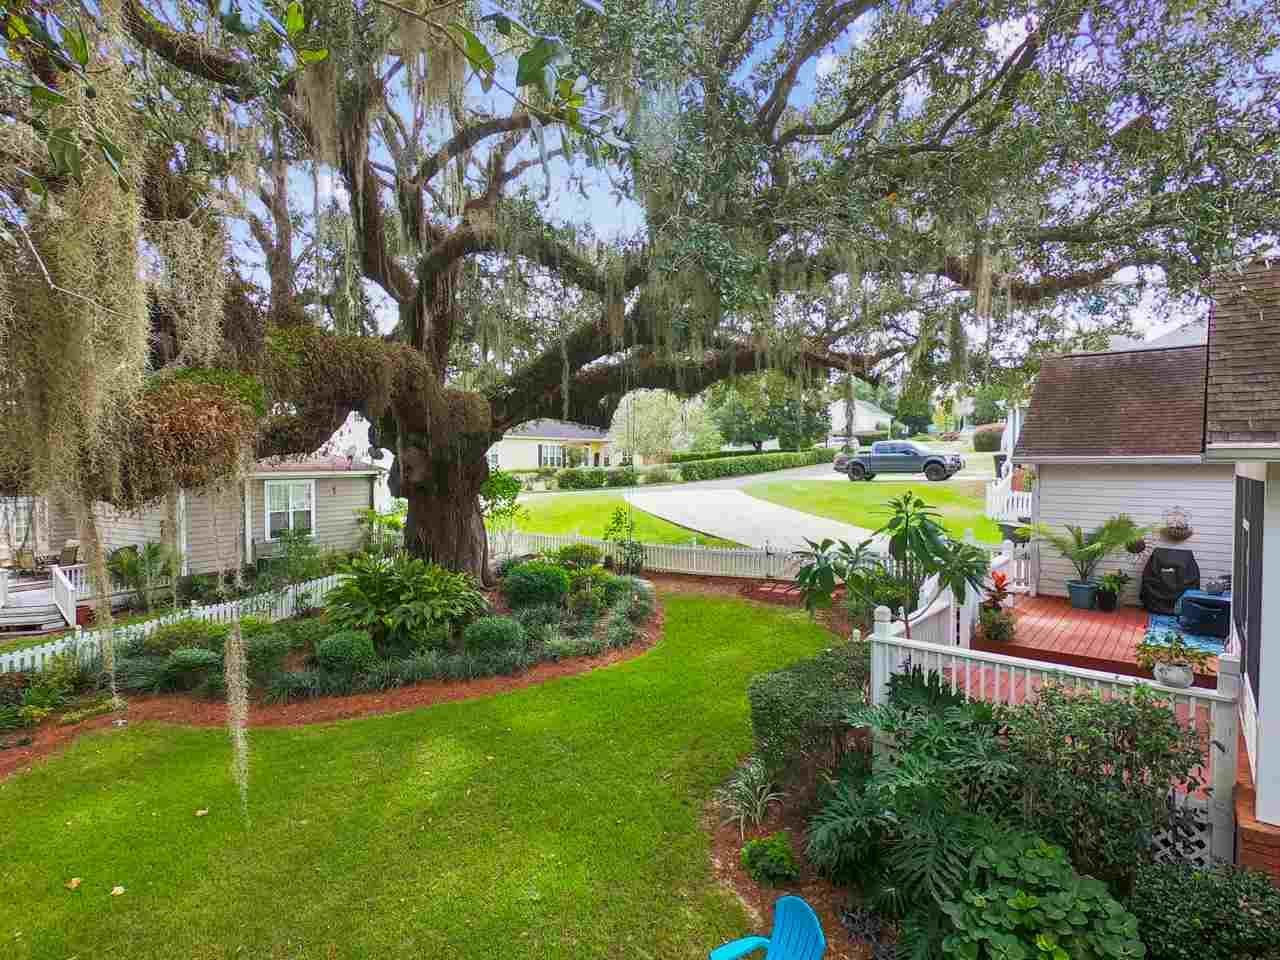 Photo of 2131 Sunlight Terrace, TALLAHASSEE, FL 32311 (MLS # 323231)